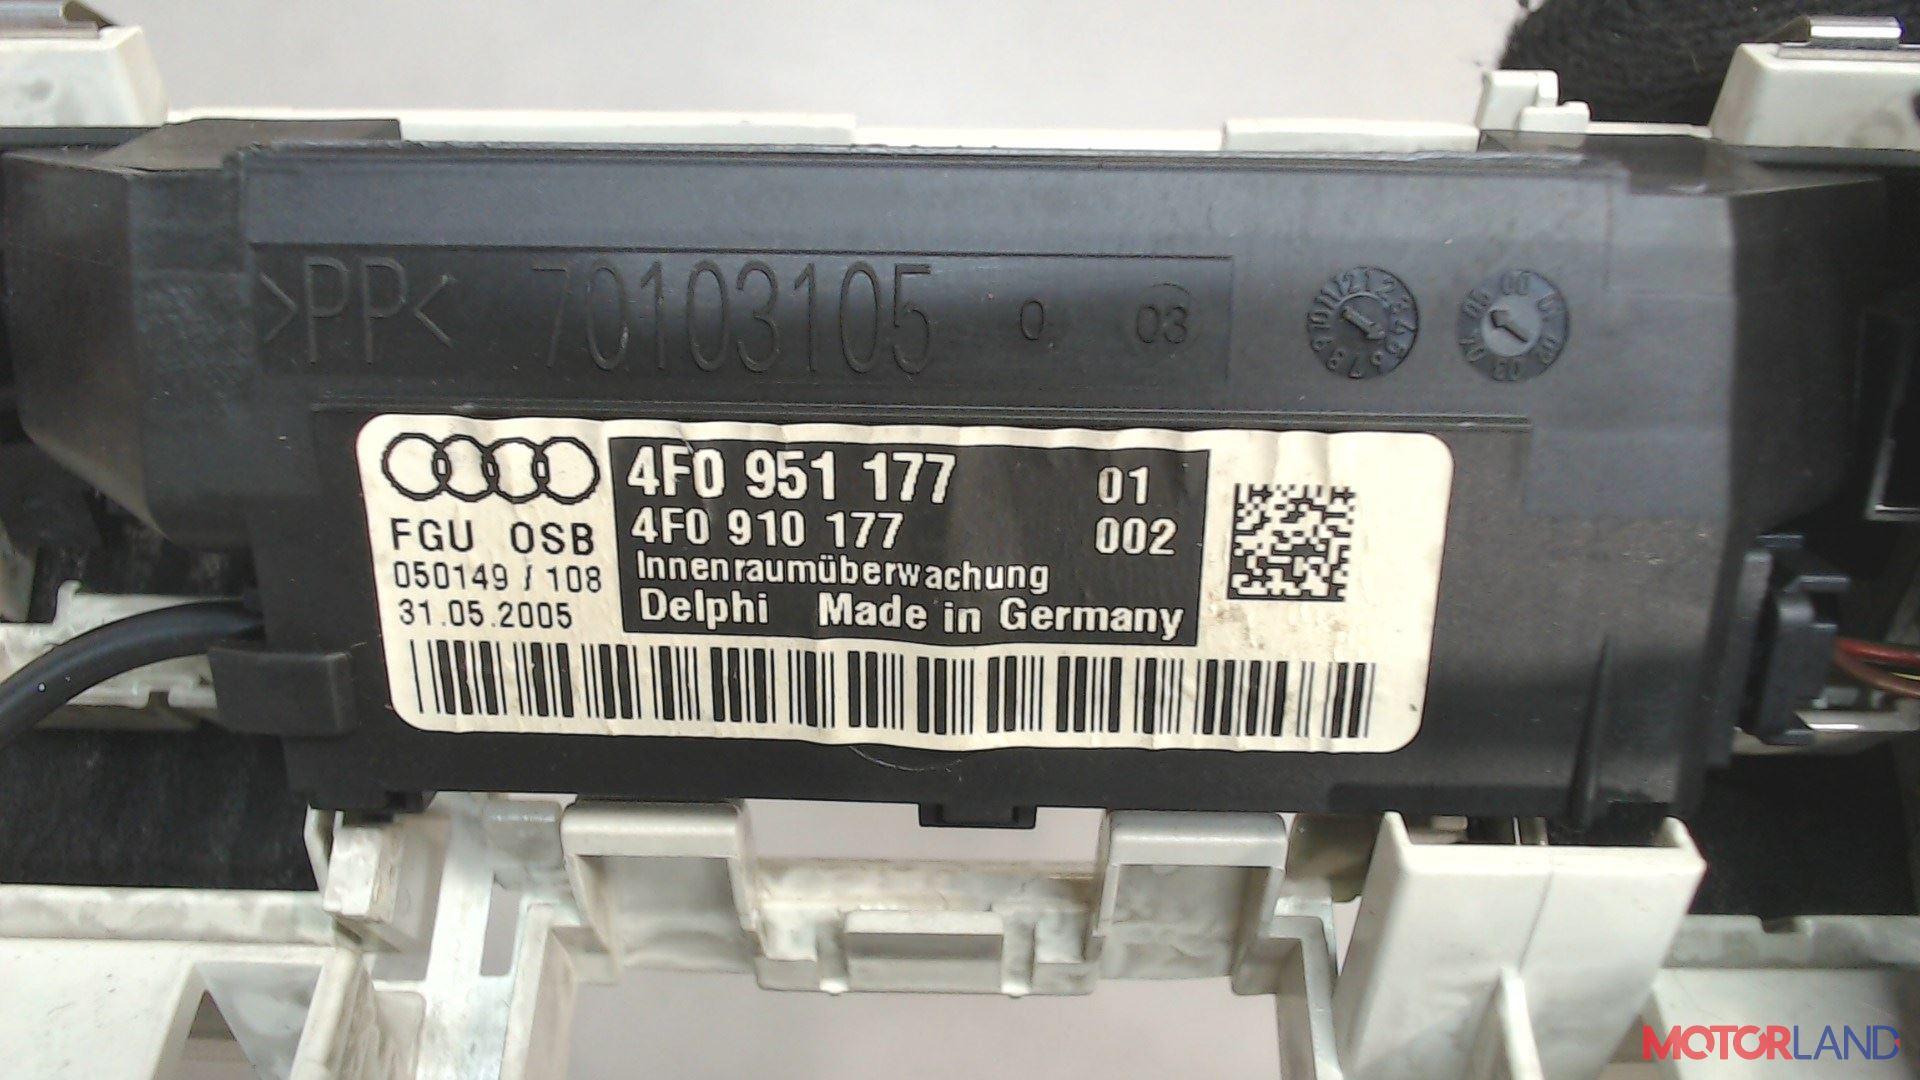 Фонарь салона (плафон) Audi A6 (C6) 2005-2011 3 л. 2005 BMK б/у #3